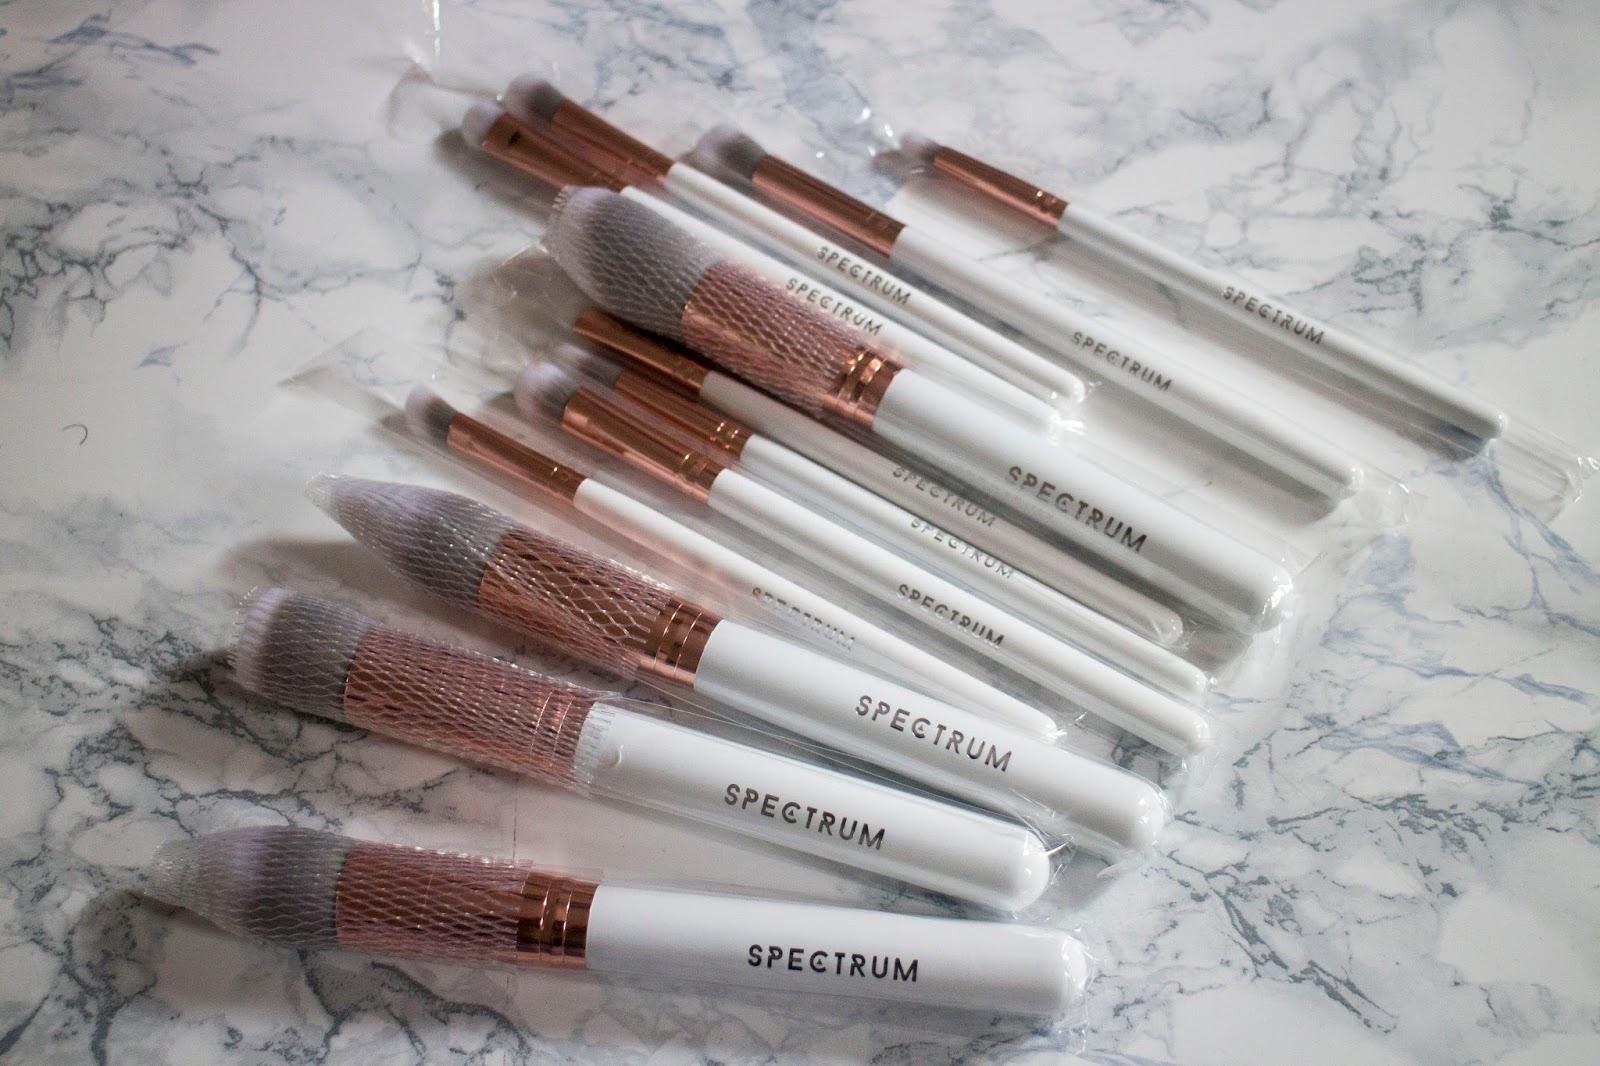 New In Makeup Spectrum Brushes